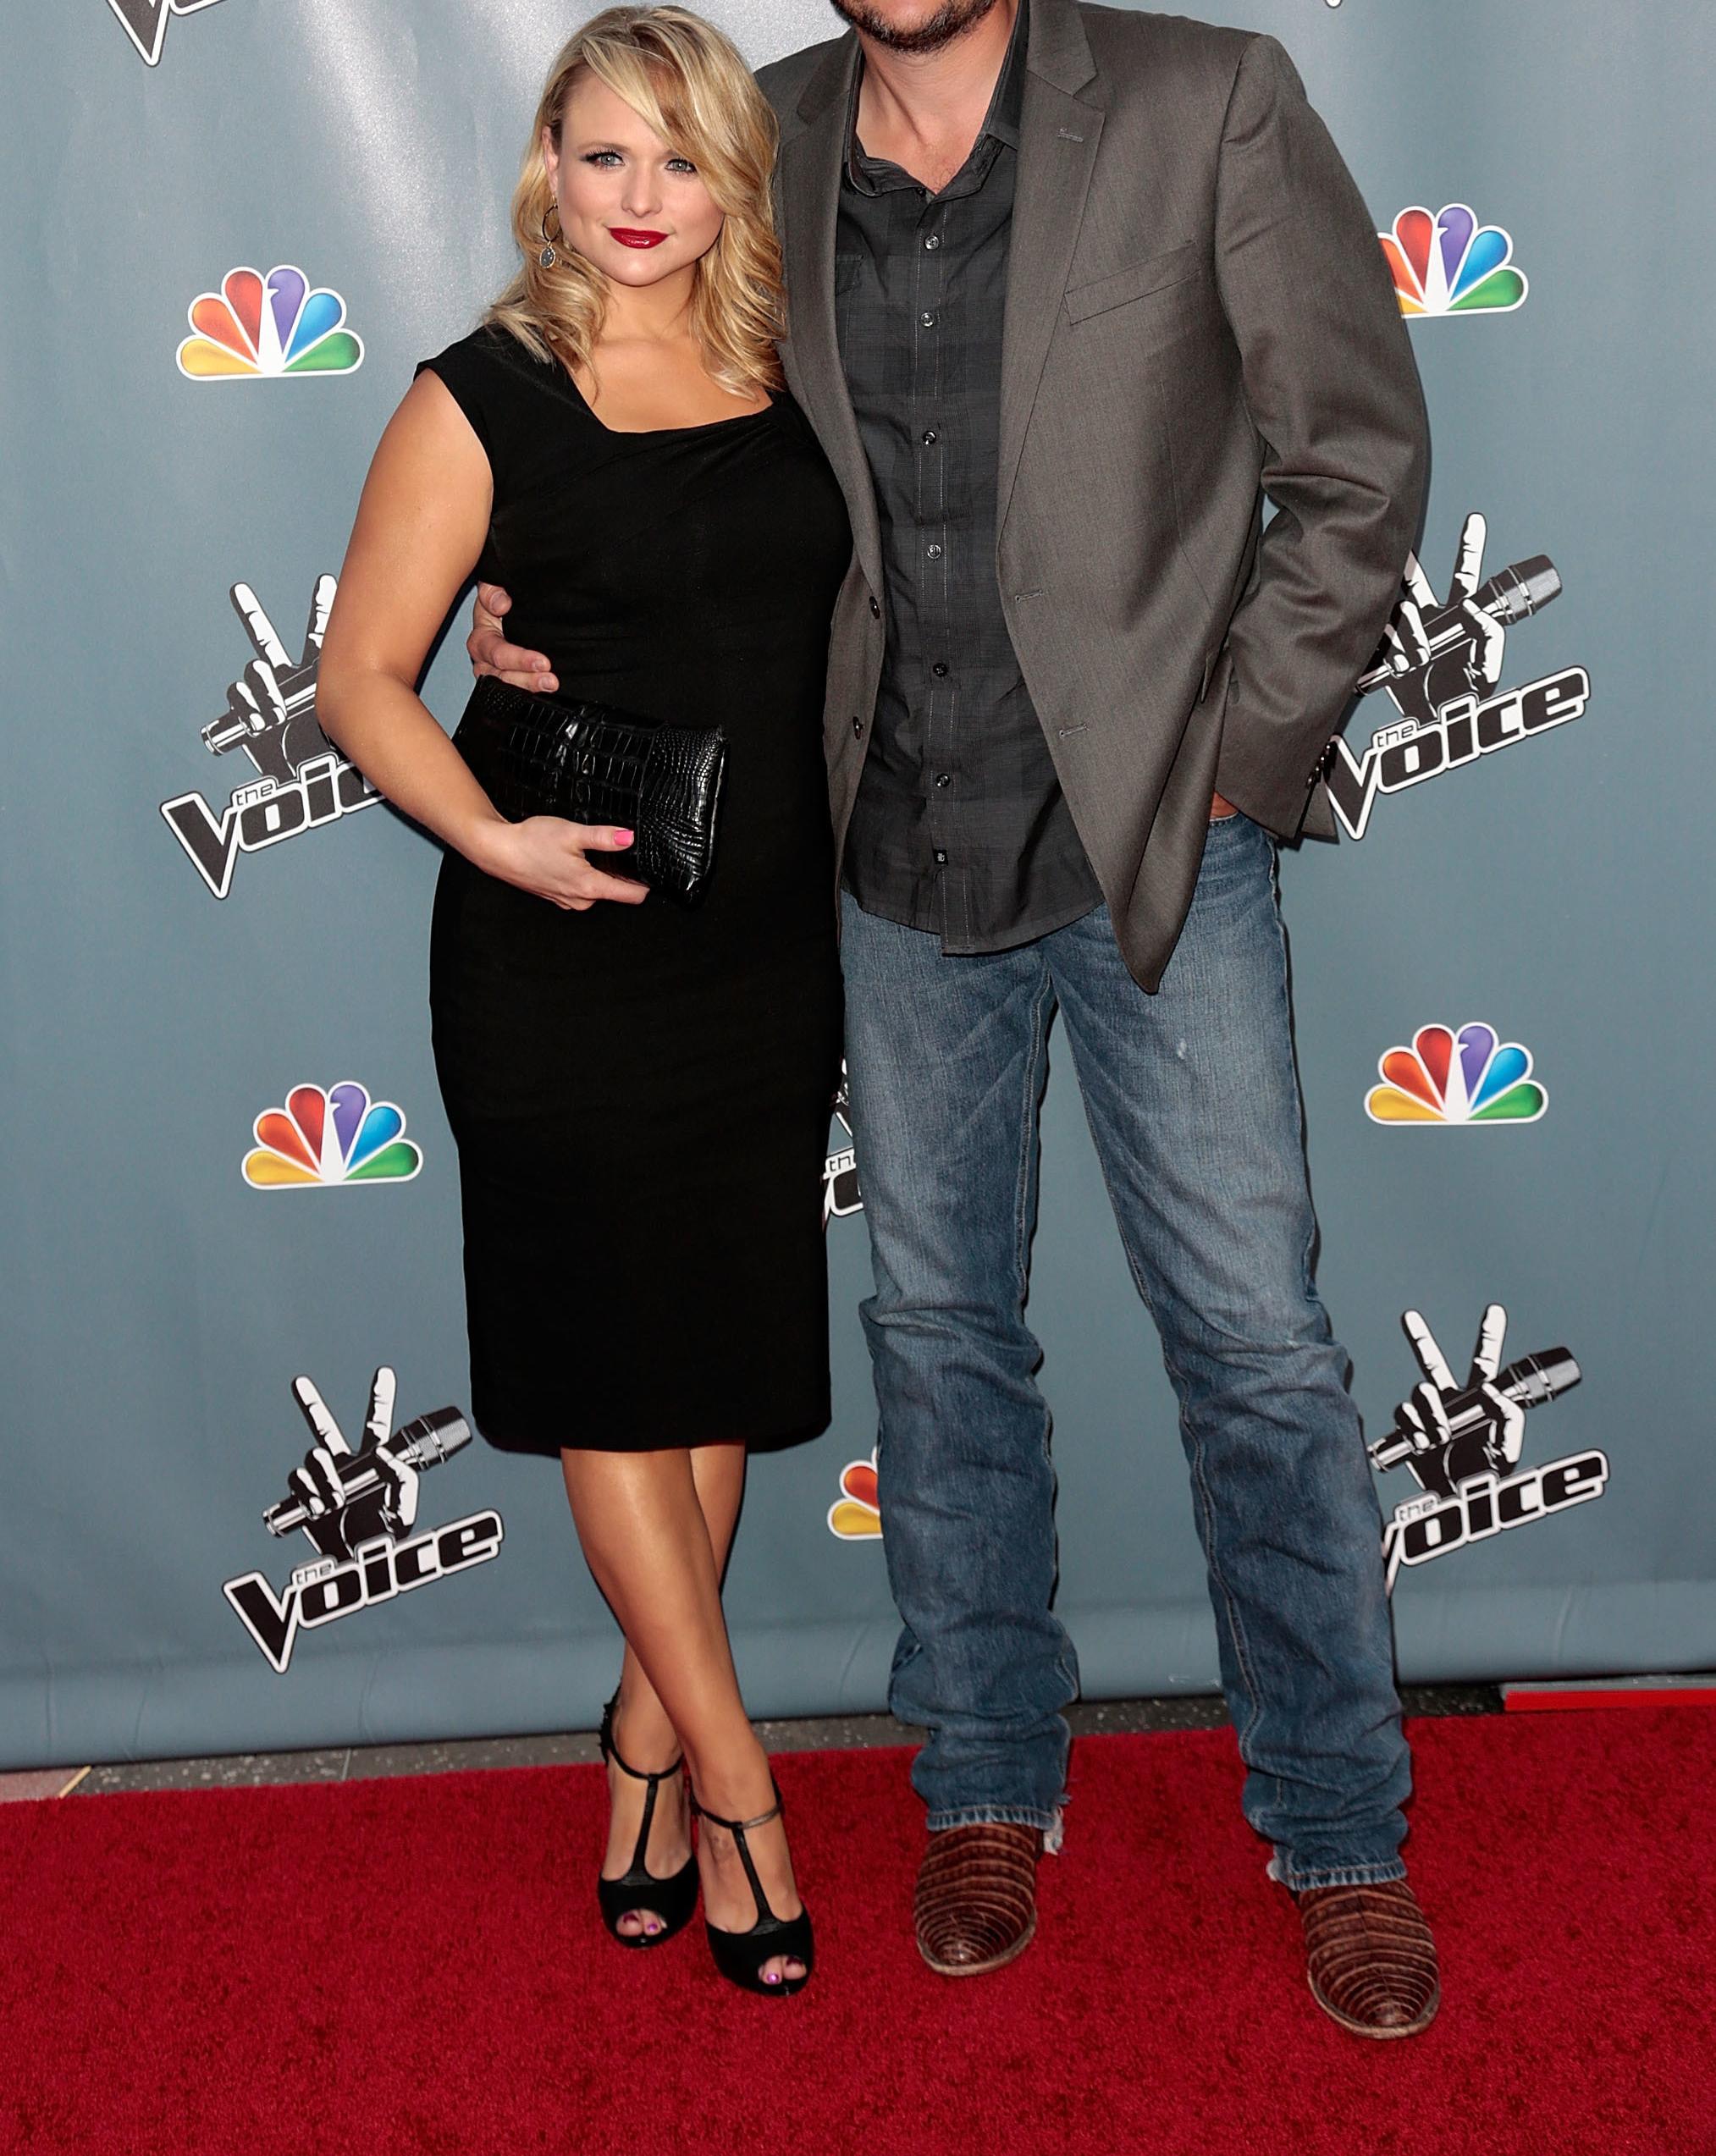 reveal guess the tall celeb guy Miranda Lambert and Blake Shelton